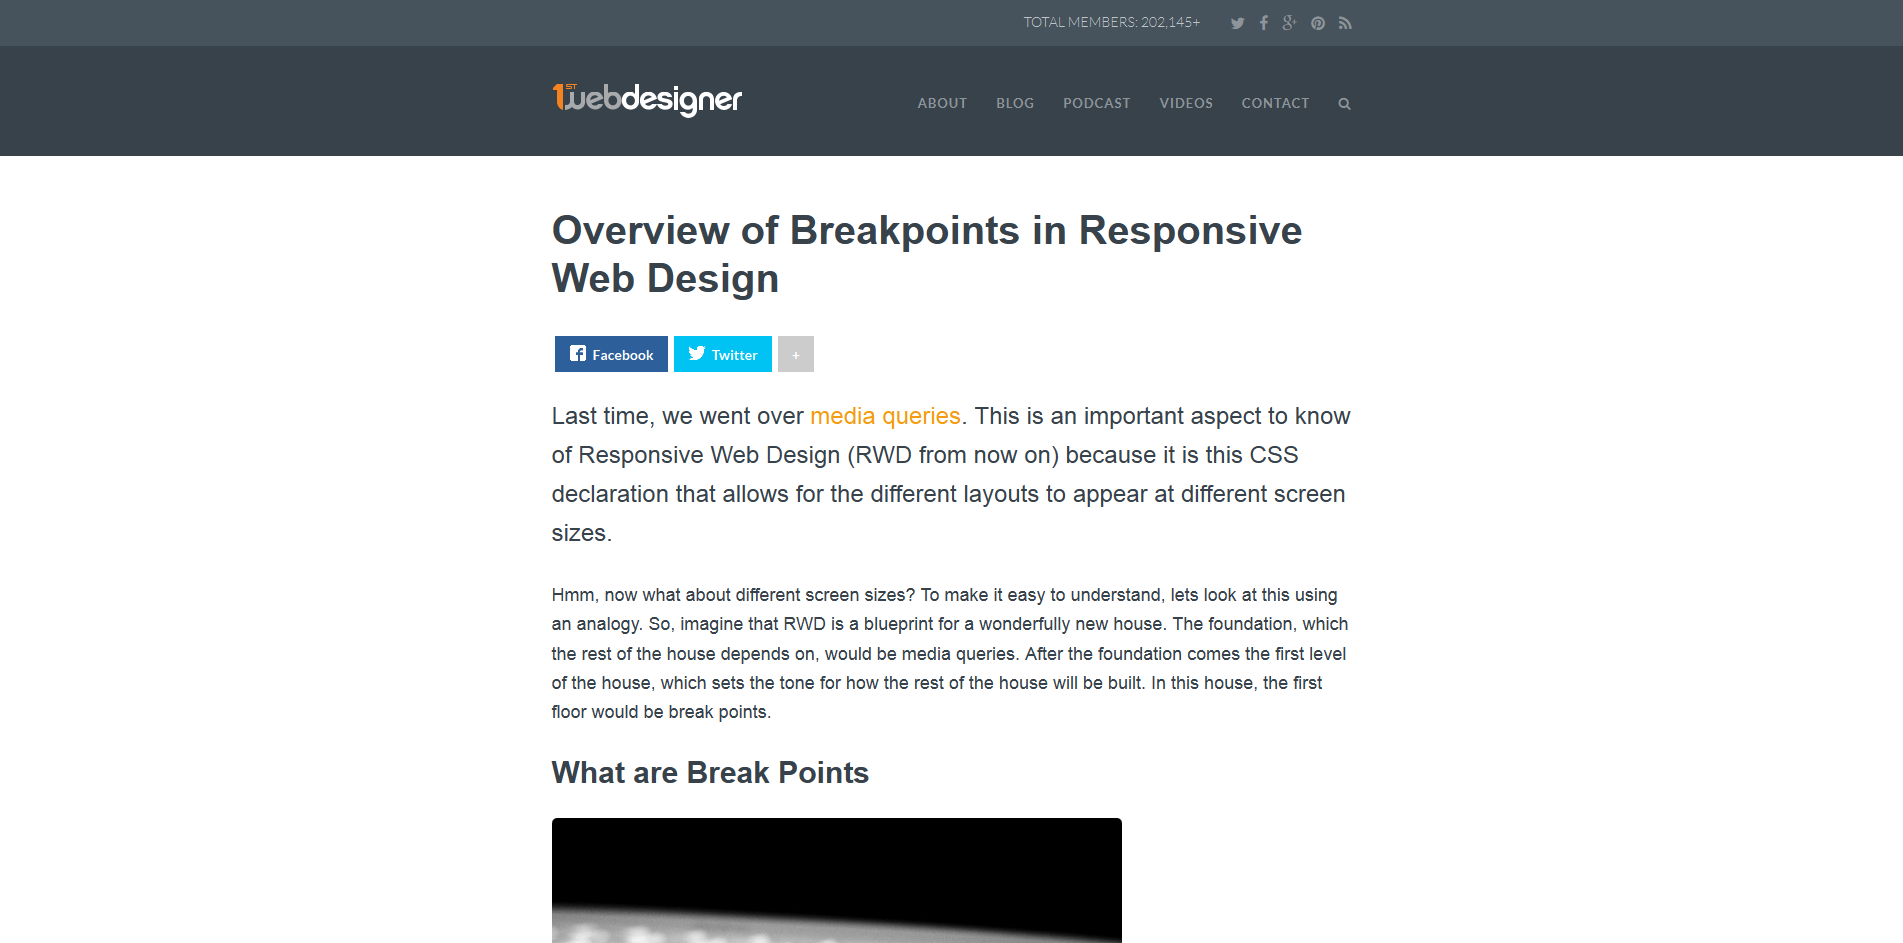 Responsive Web Design Common Breakpoints